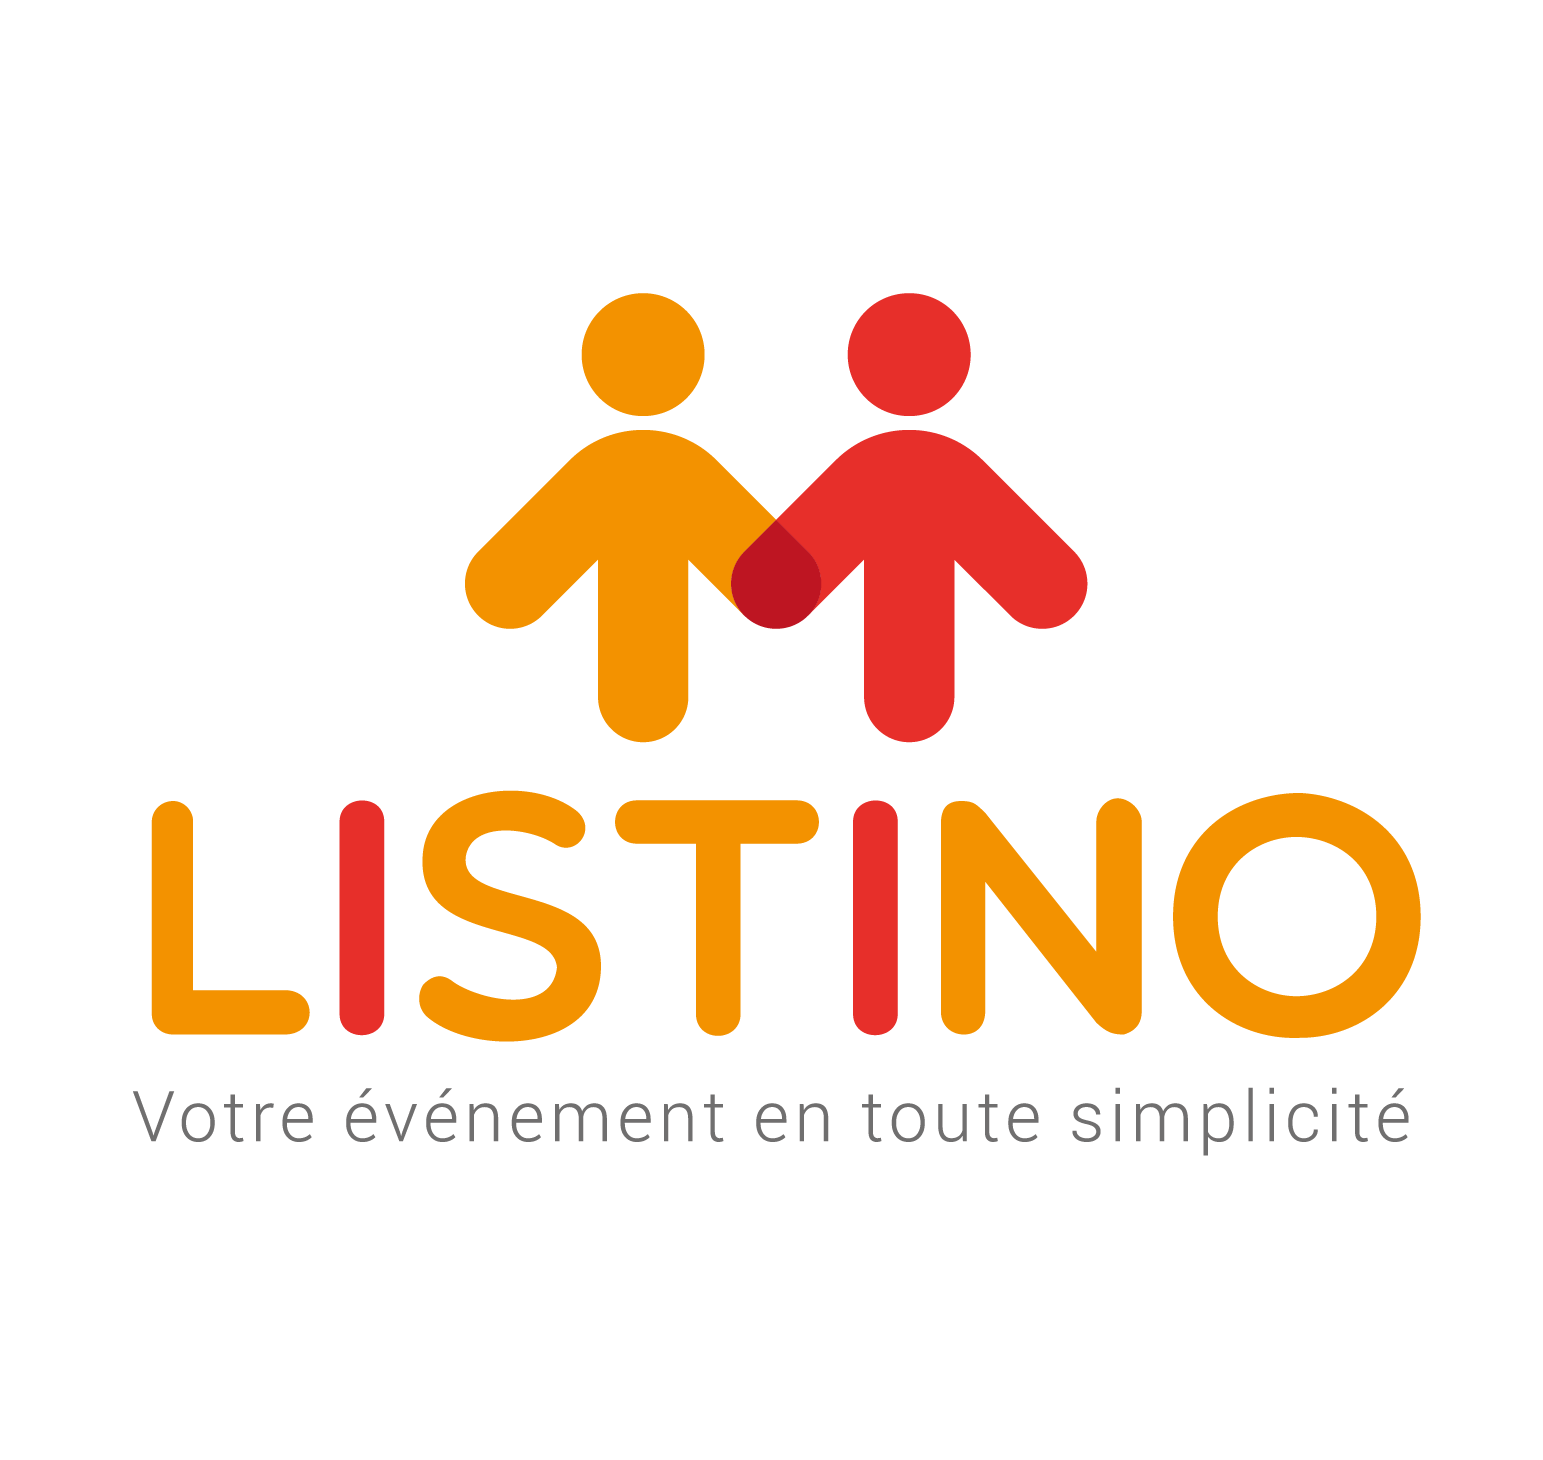 Logo_Listino_Vertical.png - 300 DPI